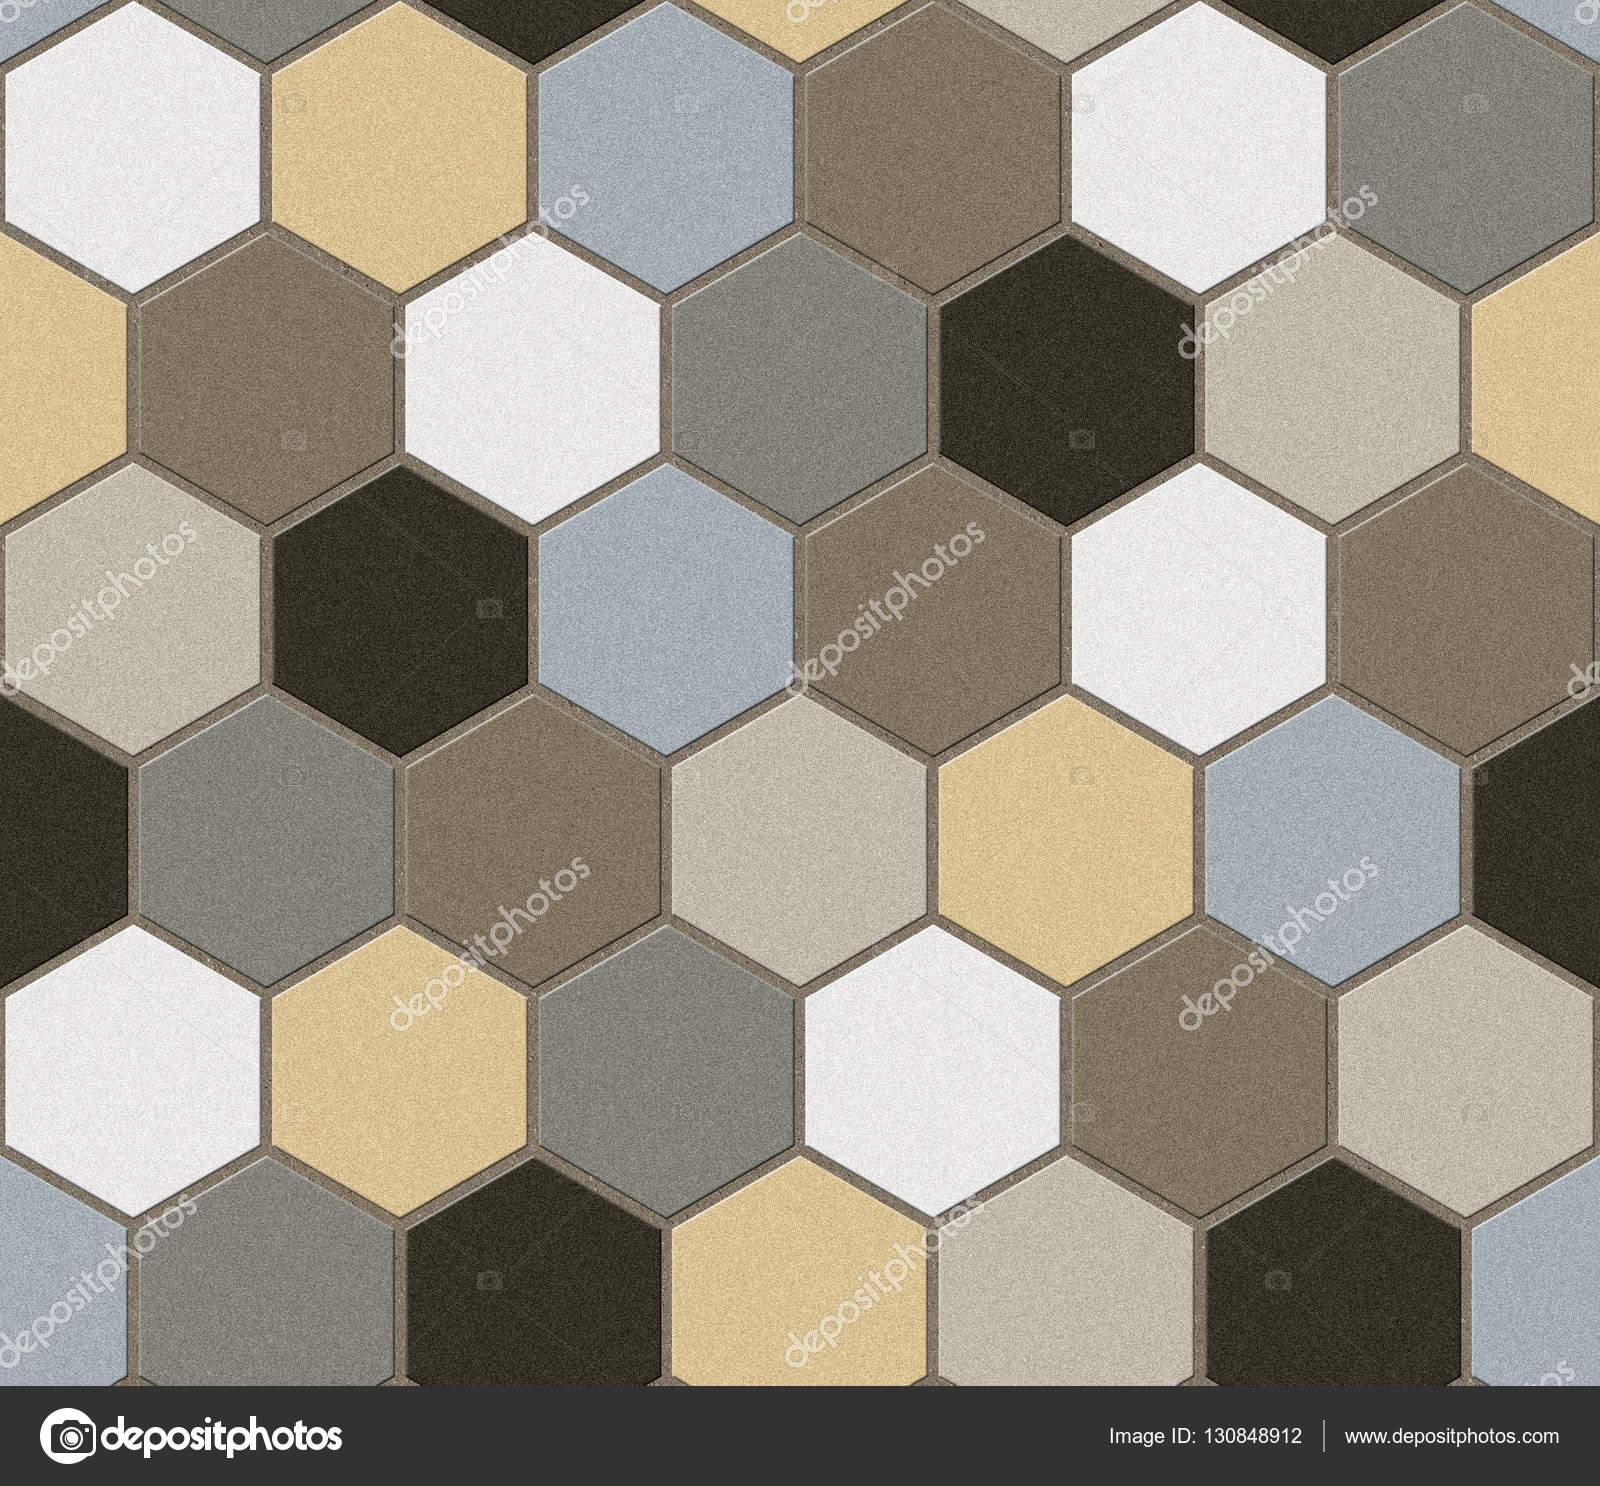 Hexagonal Tiles Patchwork Seamless Texture Stock